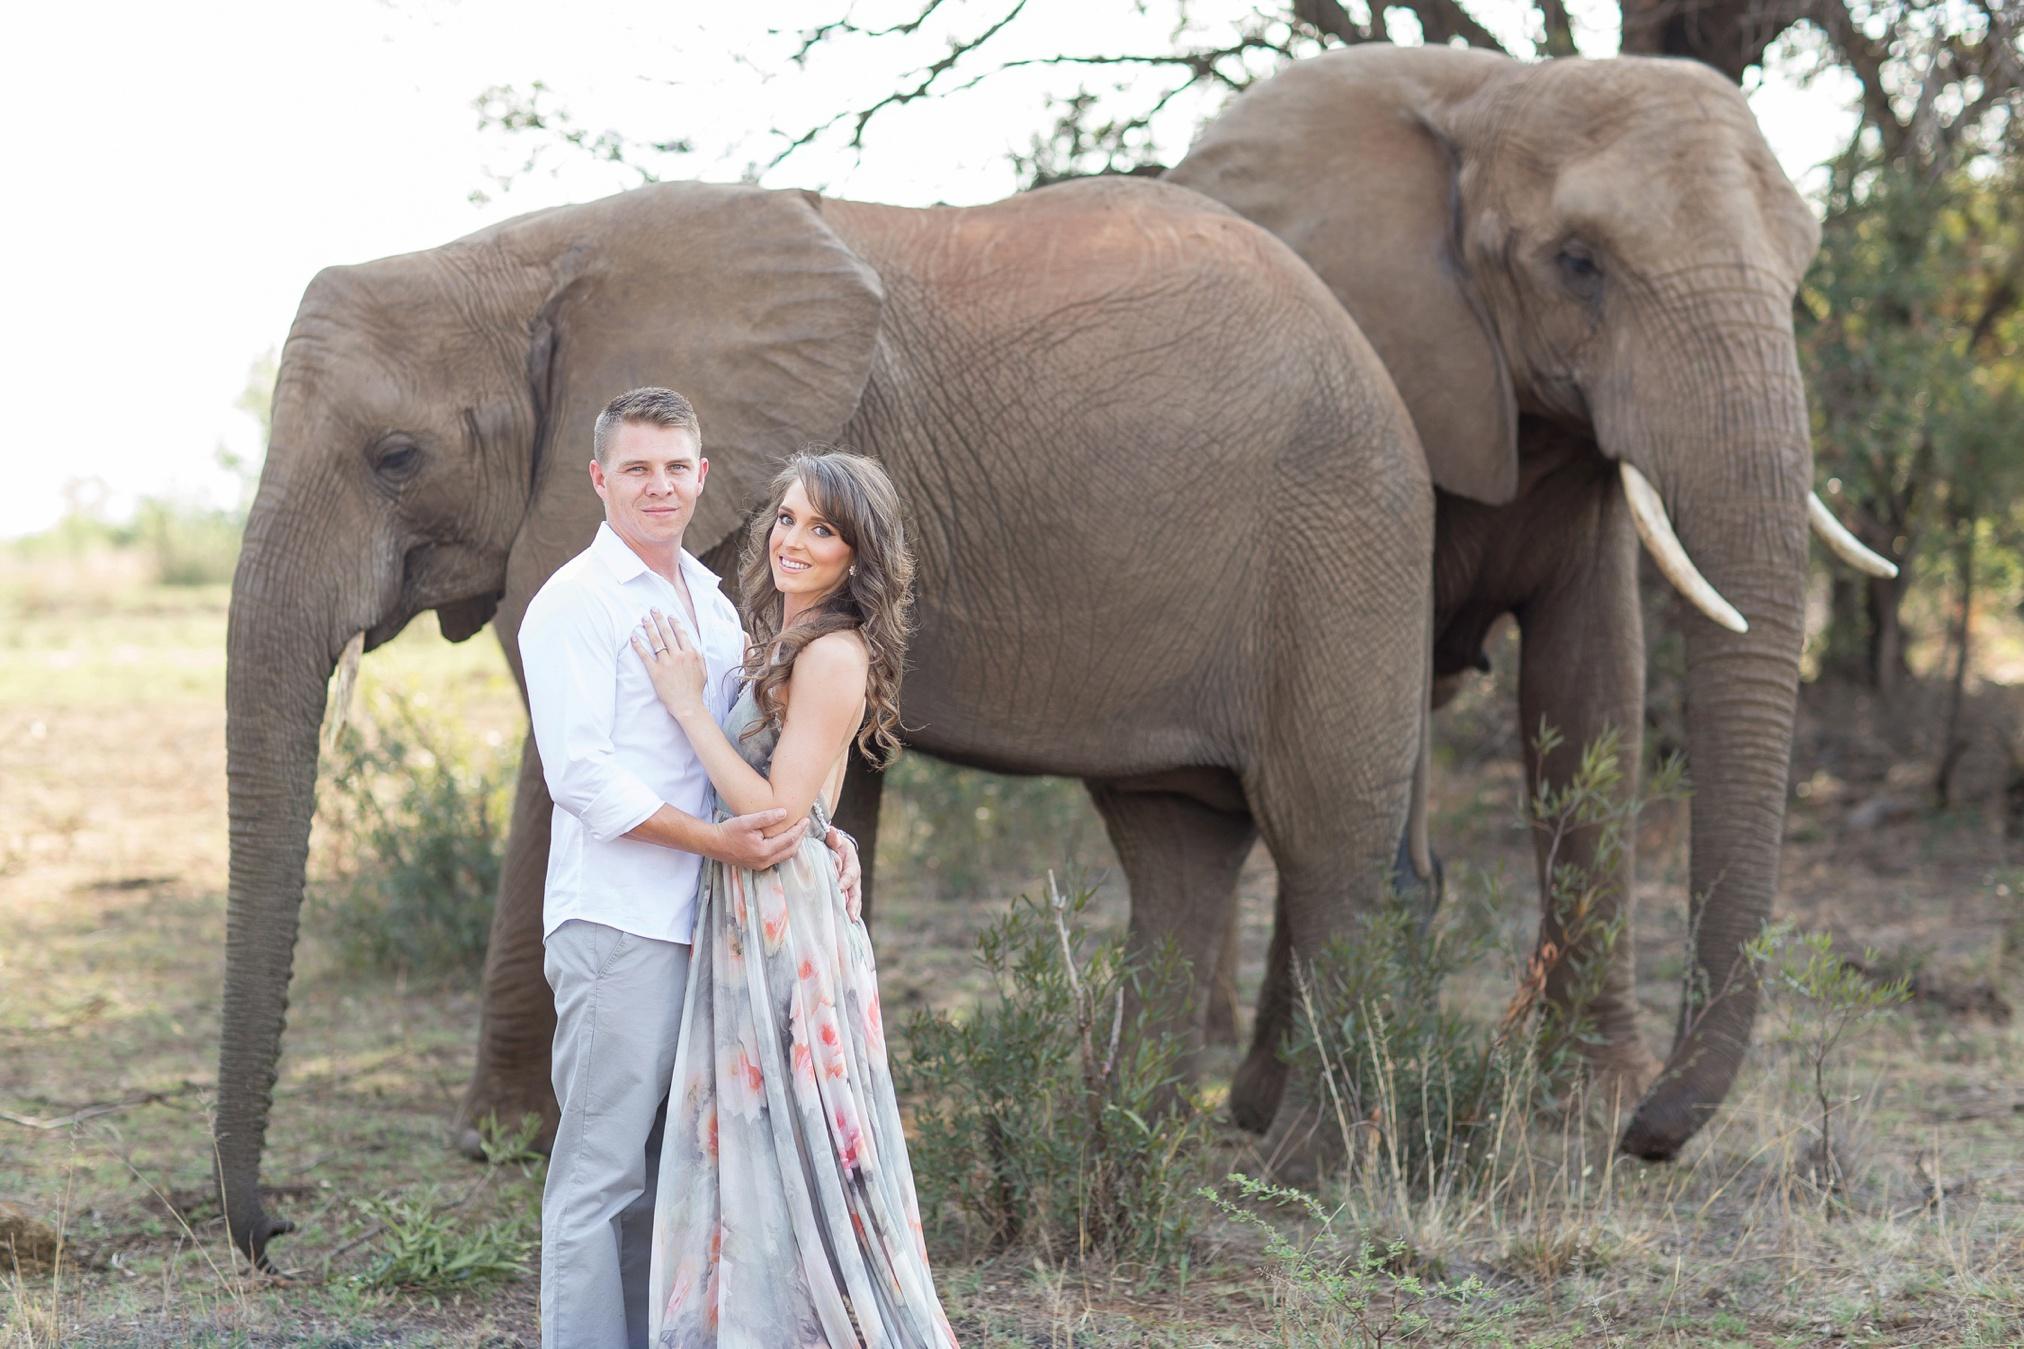 Glen_Afric_Kyle_and_Lindsay_engagement_elephants_safari_11